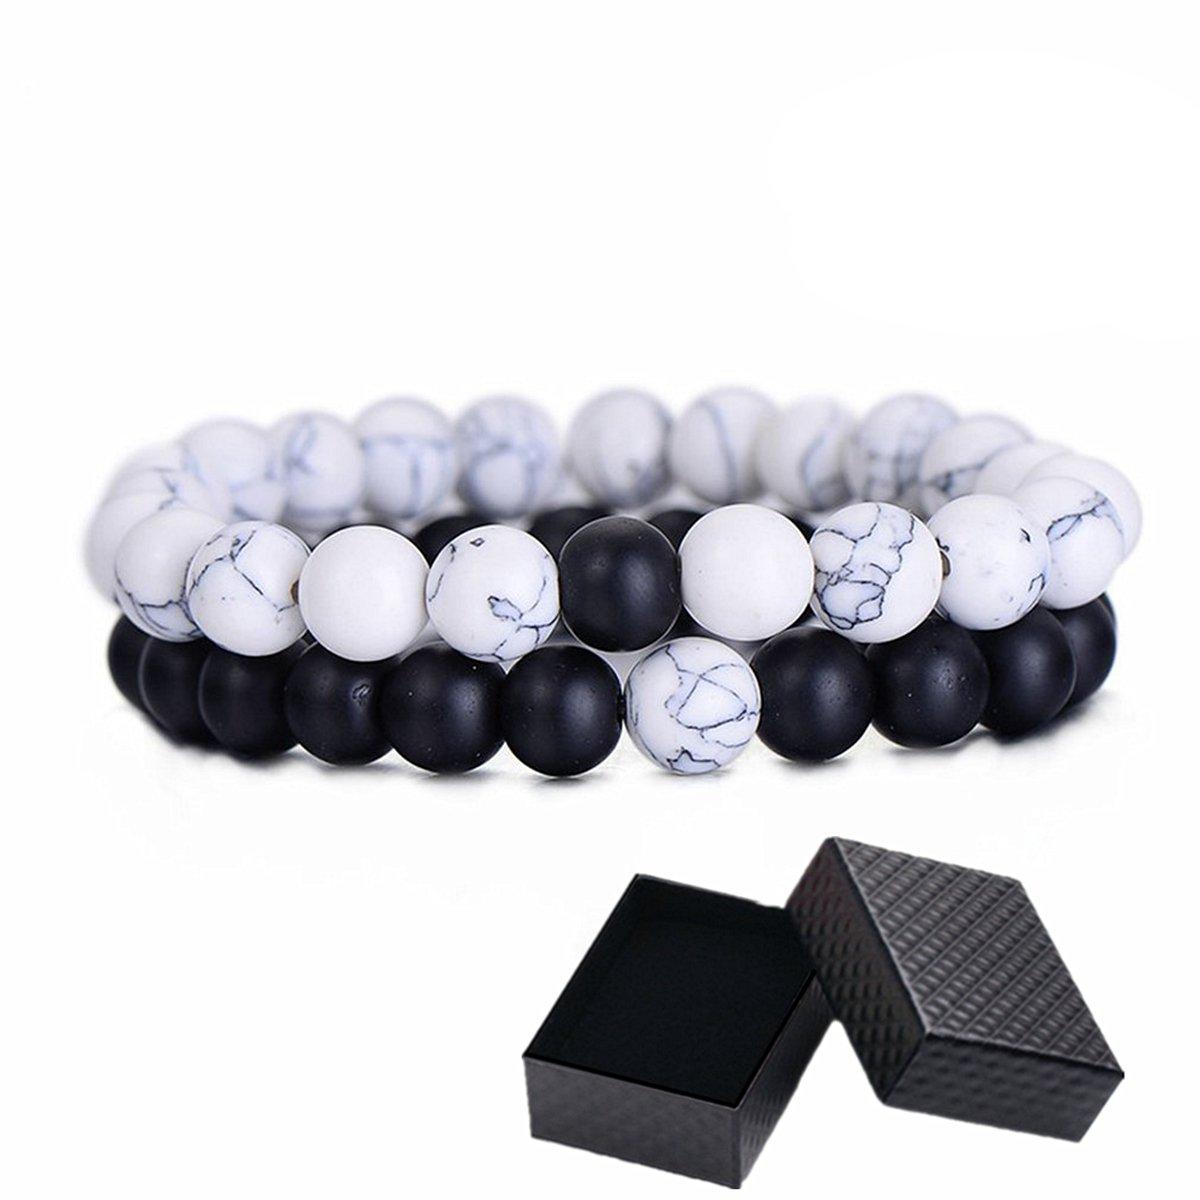 Distance Couples Bracelets, His Hers Black Agate Onyx White Howlite Relationship Bracelet for Lover SEALEN Distance Bracelet